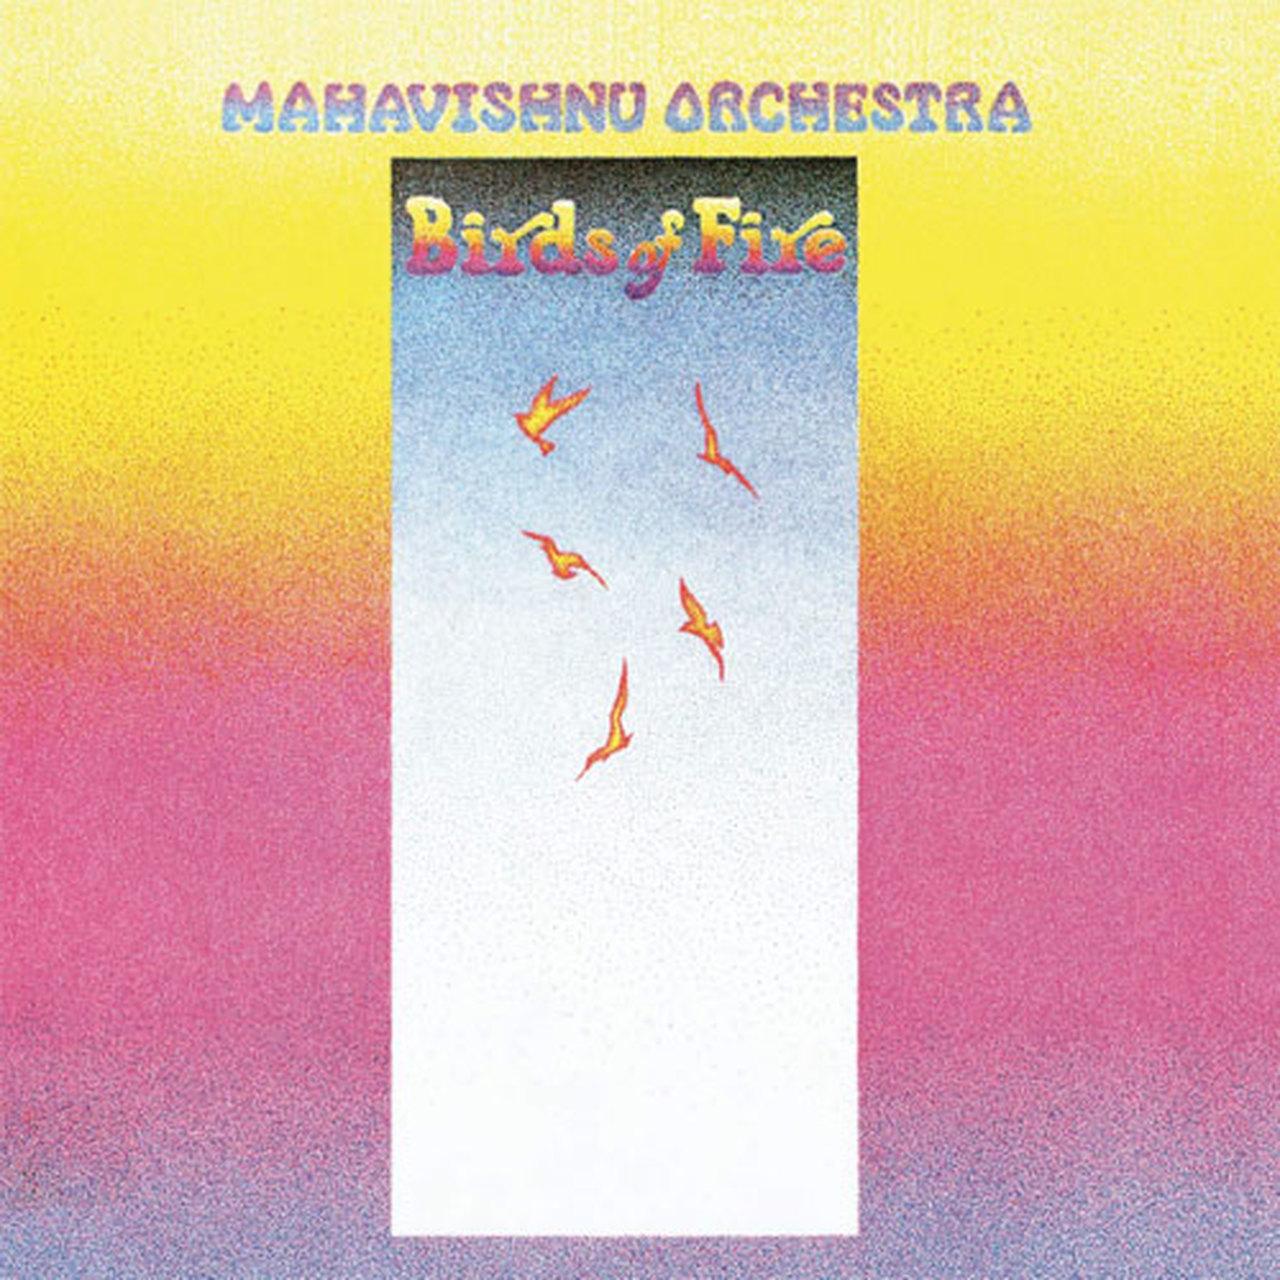 Mahavishnu Orchestra: Birds Of Fire - Speakers Corner 180g LP (KC 31996)